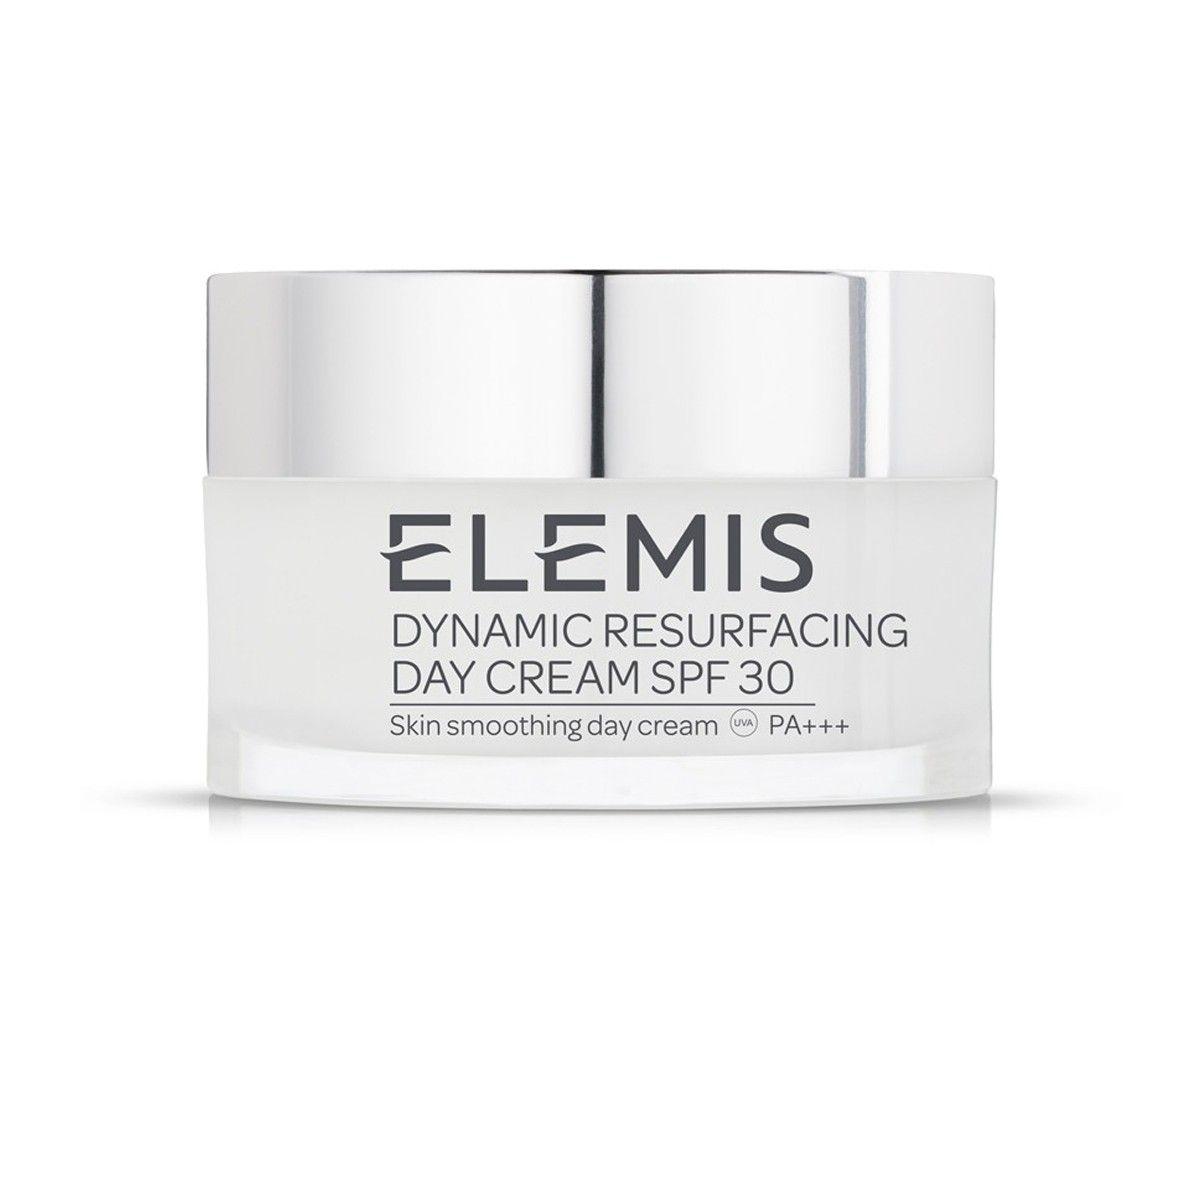 Afbeelding van Elemis Dynamic Resurfacing Day Cream Spf30 50Ml Beauty